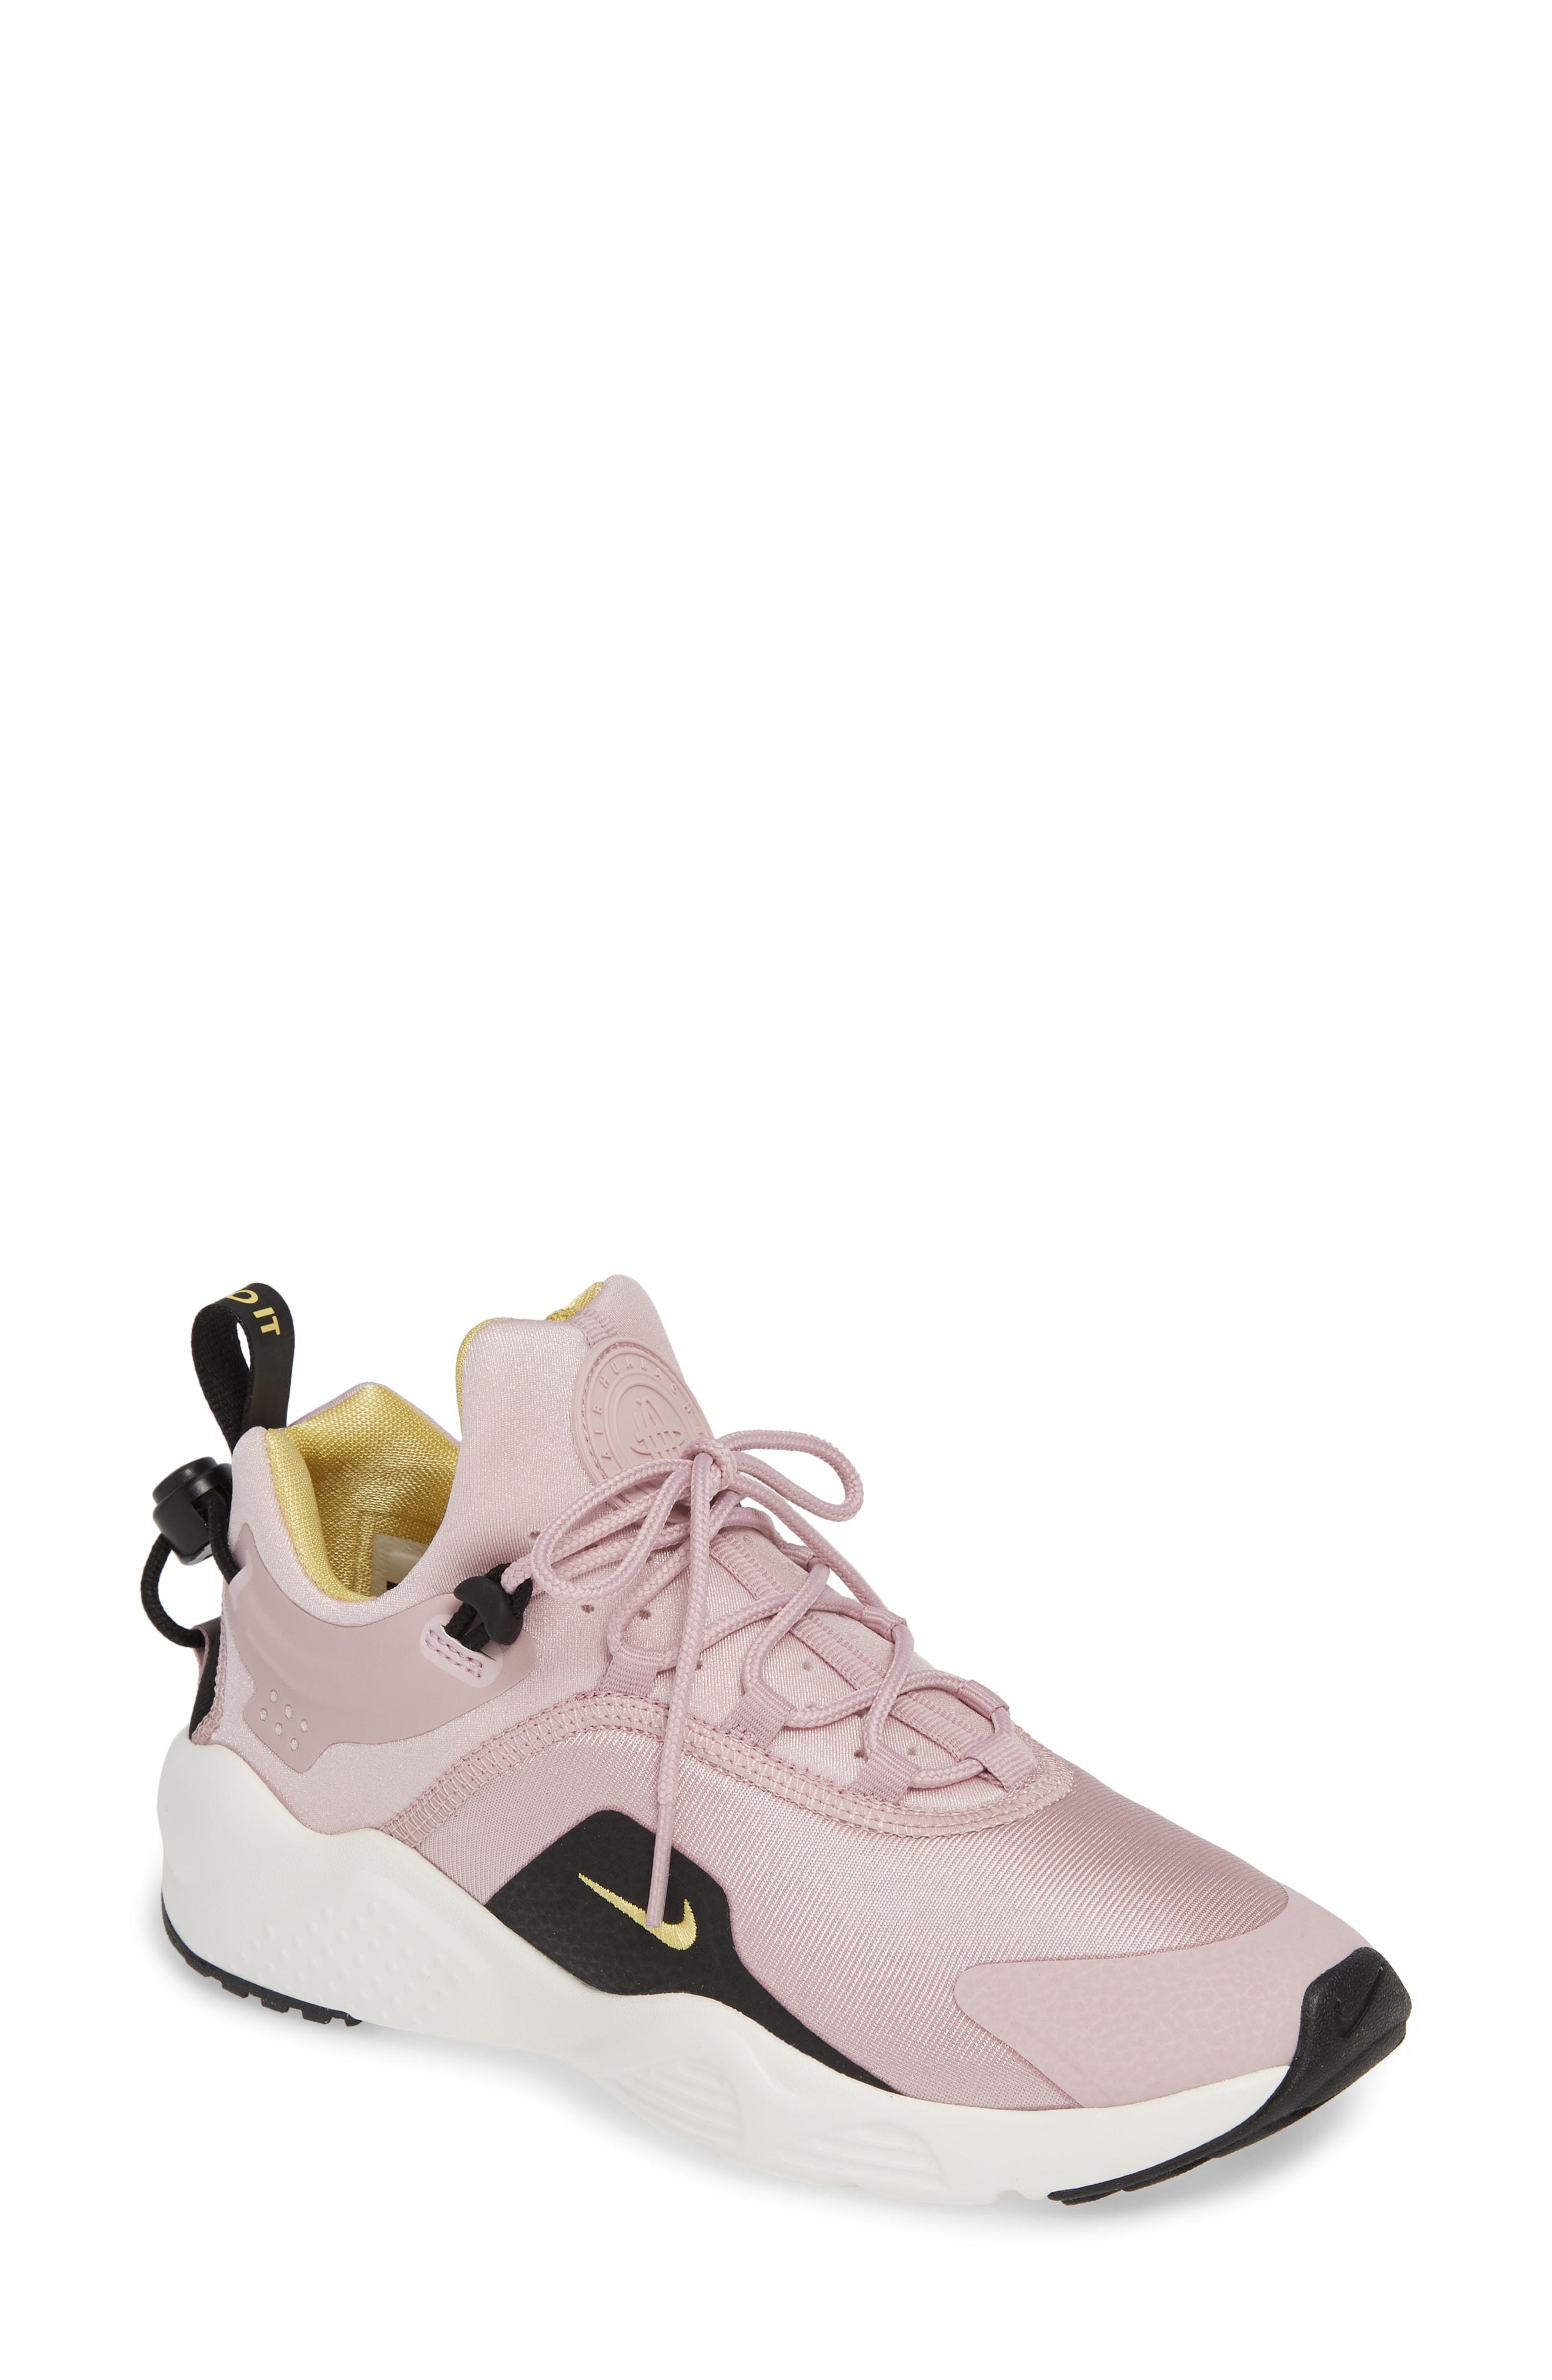 01710cea5b7b6 Nike Women s Air Huarache City Move Low Top Sneakers In Plum Chalk  Celery   Black